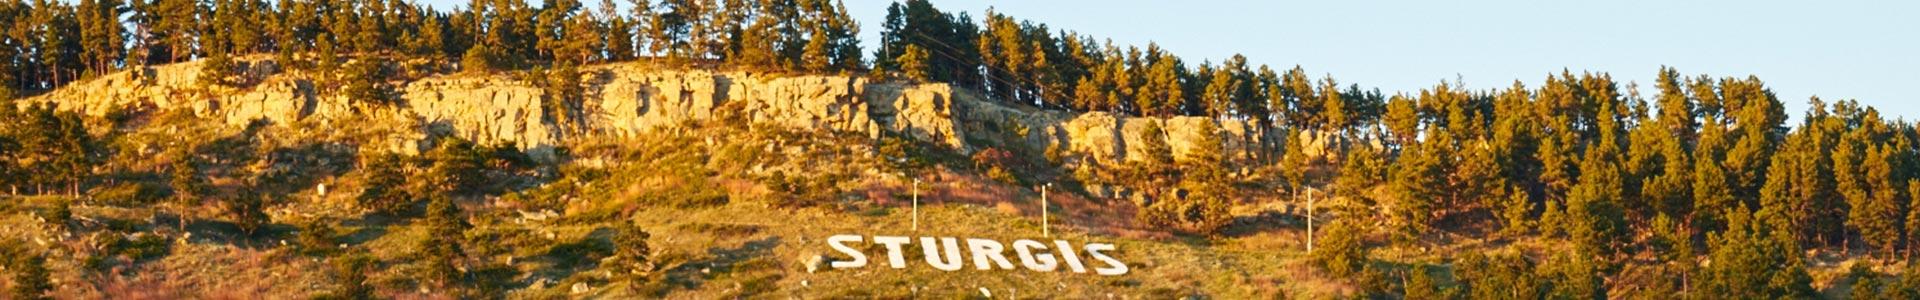 sturgis1